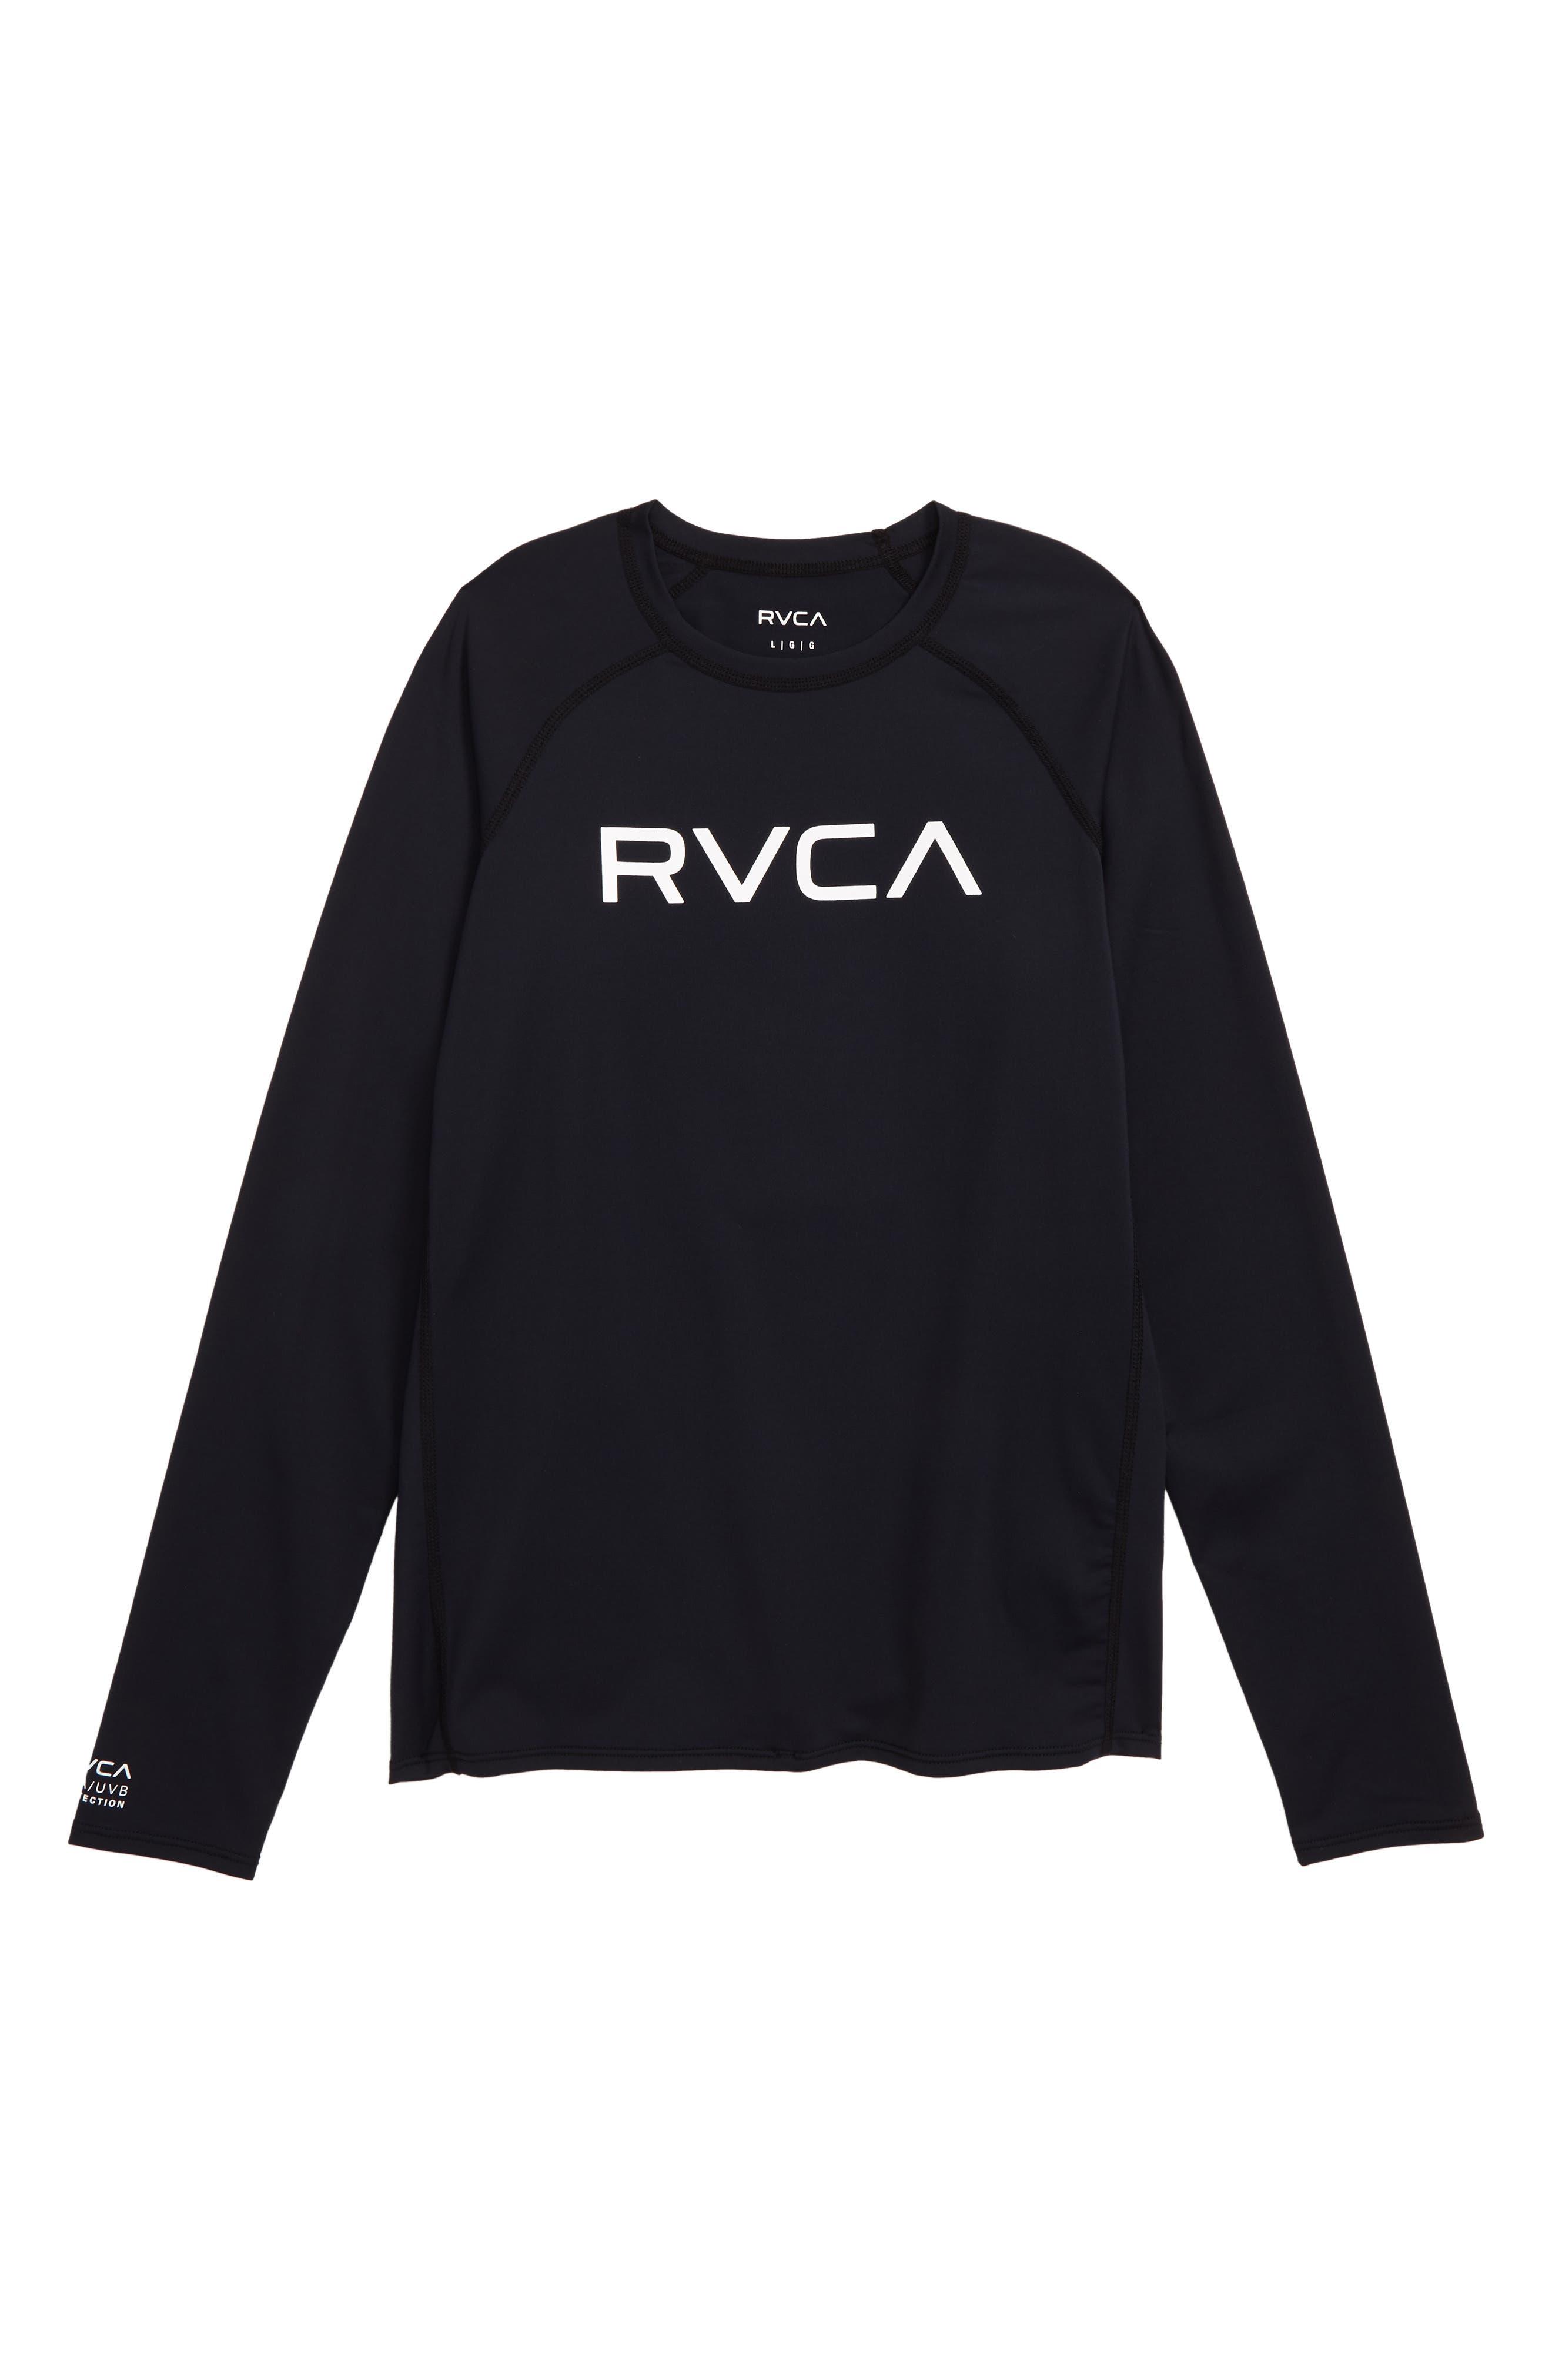 RVCA,                             Long Sleeve Rashguard,                             Main thumbnail 1, color,                             BLACK/ WHITE